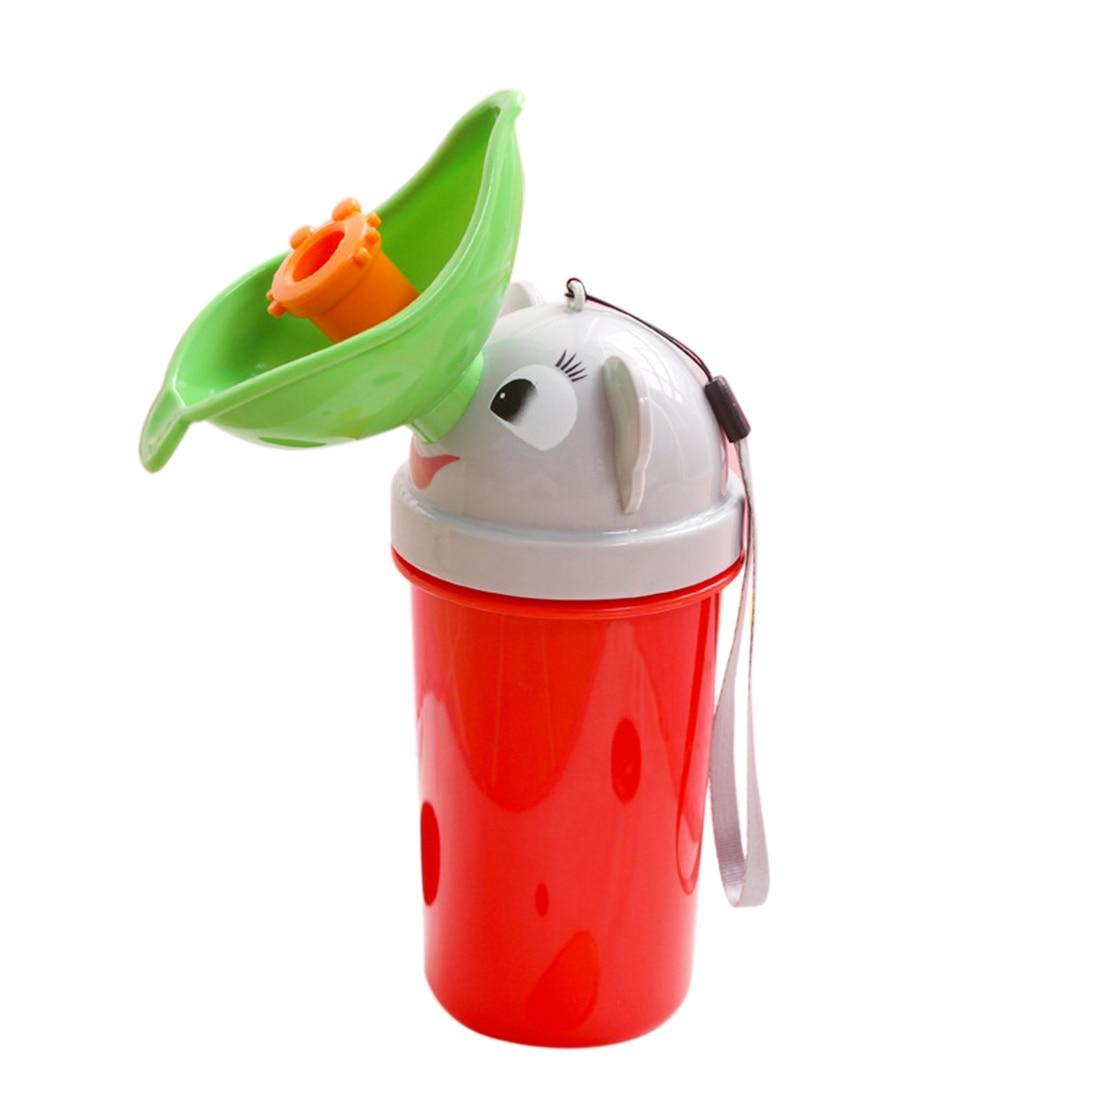 Portable Baby Potty Pee Bottle Leak Proof Emergency Toilet For Children Baby Toilet Kid Travel Folding Man Pee Tool - Girl Boy